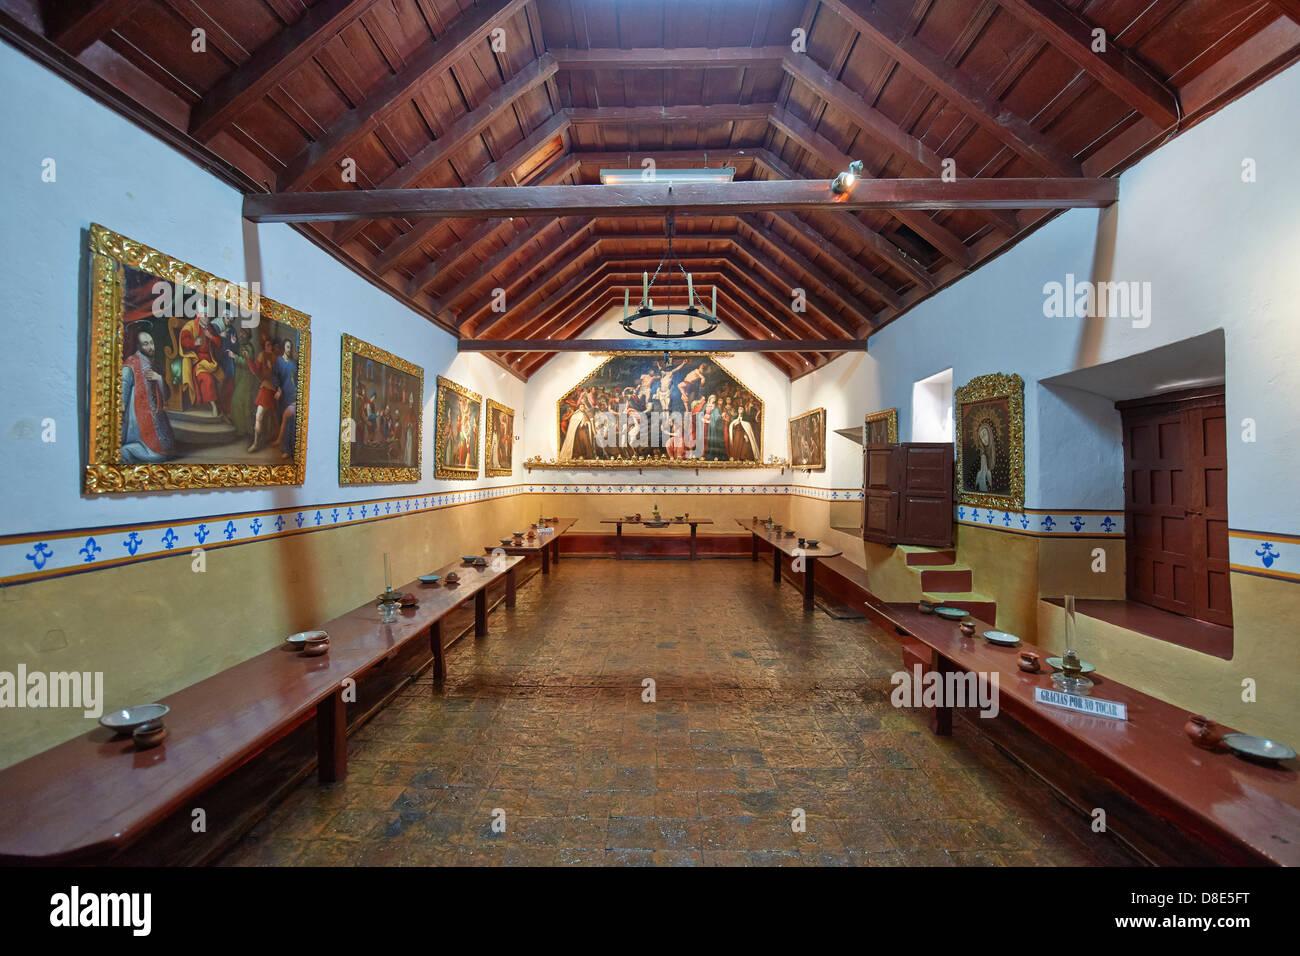 Dining room in Convento de Santa Teresa, Potosi, Bolivia - Stock Image